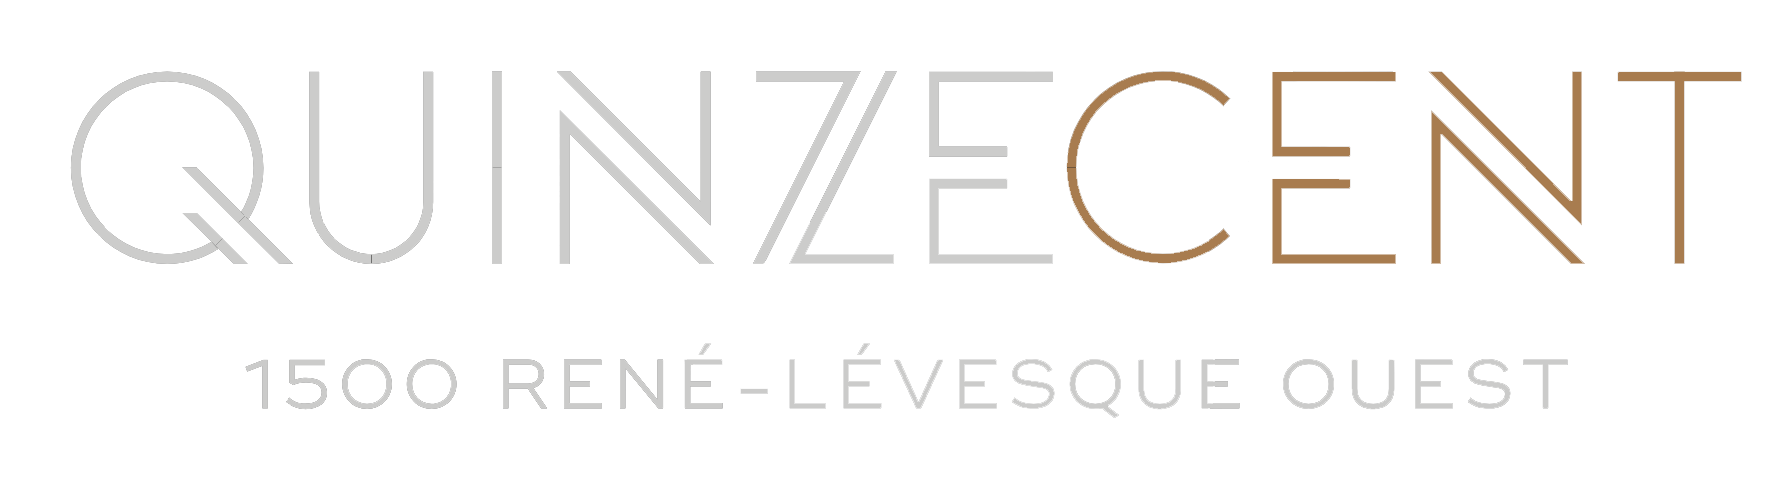 Quinzecent Condos logo - 1500 montreal condos